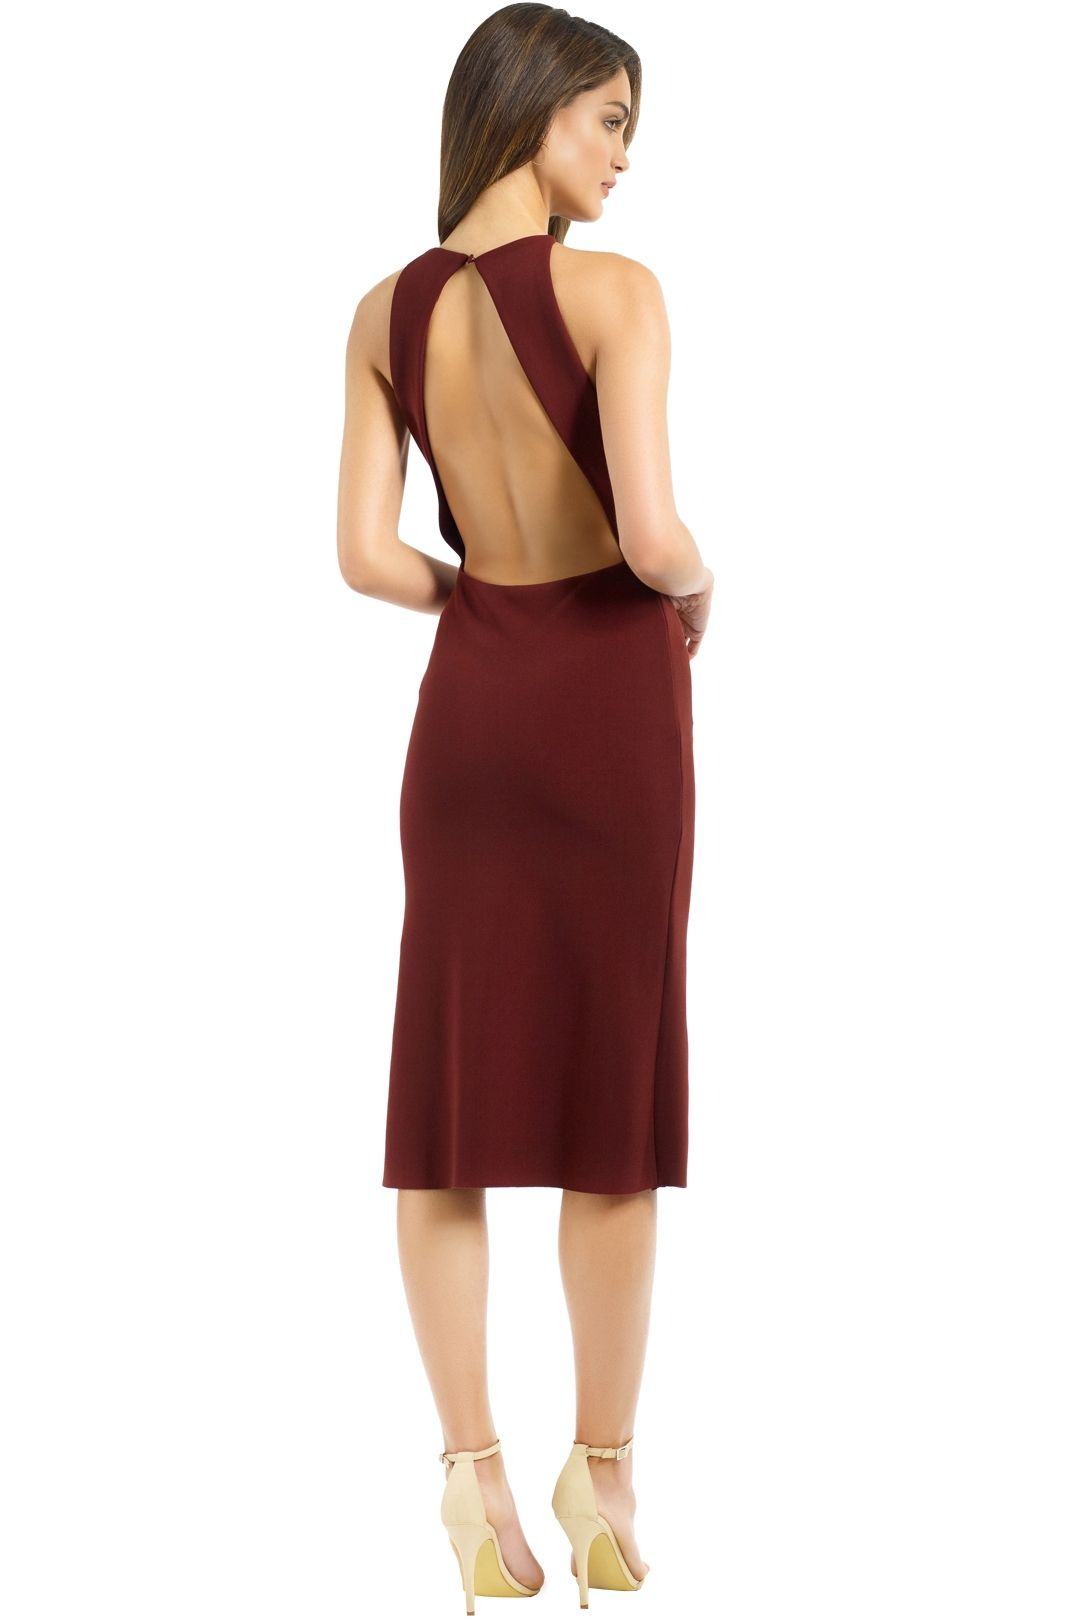 Bec and Bridge - Love Ruler Dress - Deep Rouge - Back